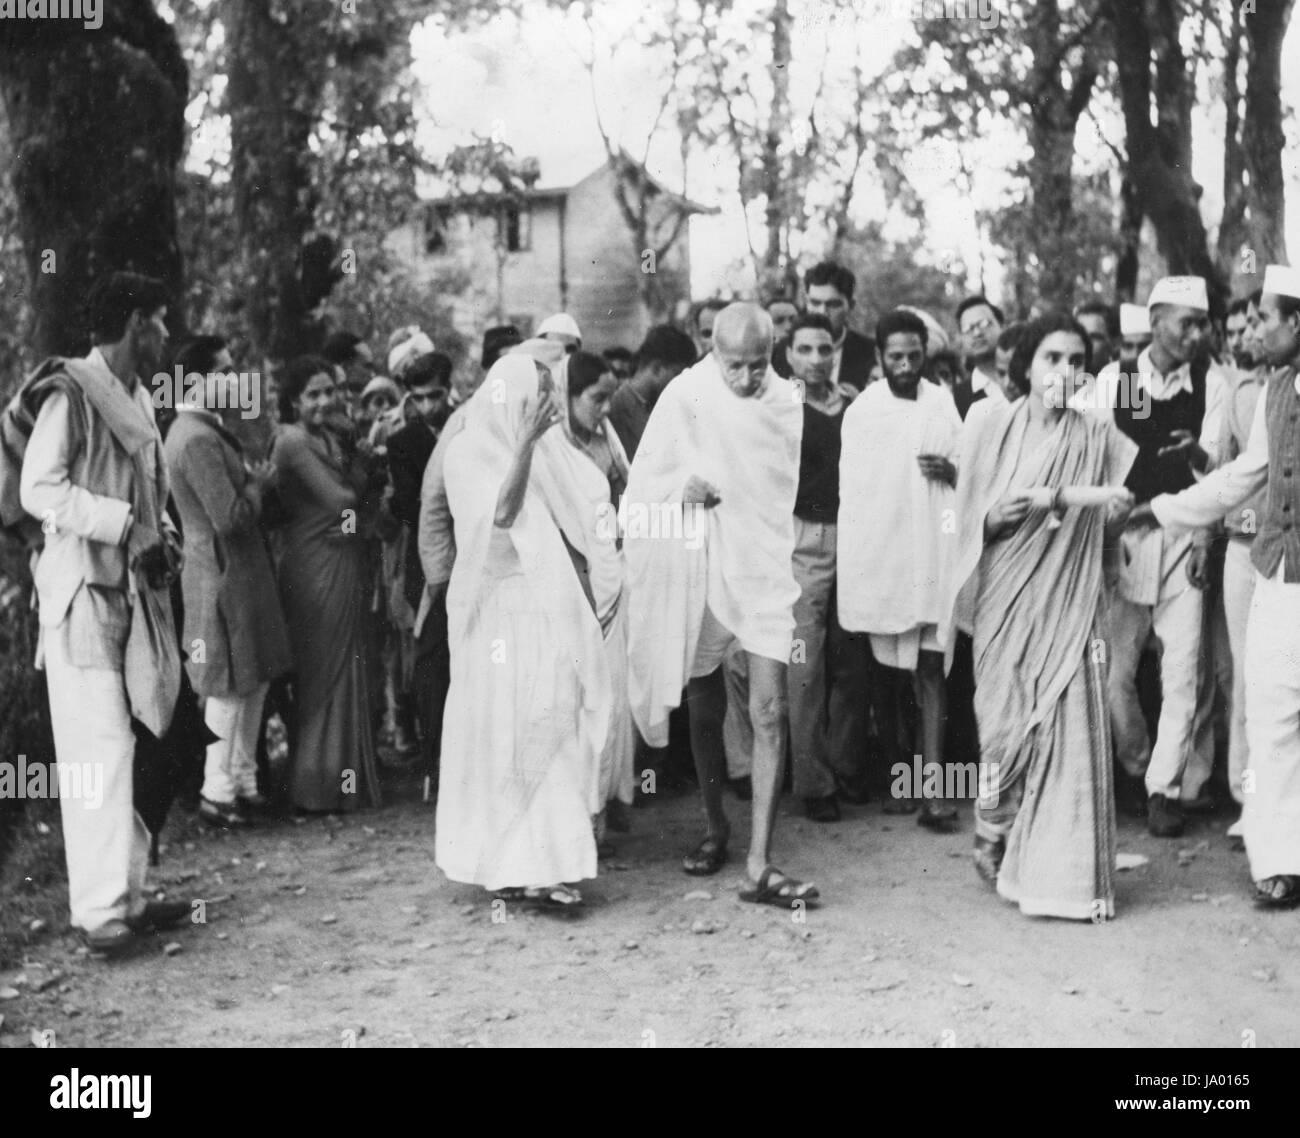 Mohandas K. Ghandi and his followers, India, 1945. - Stock Image